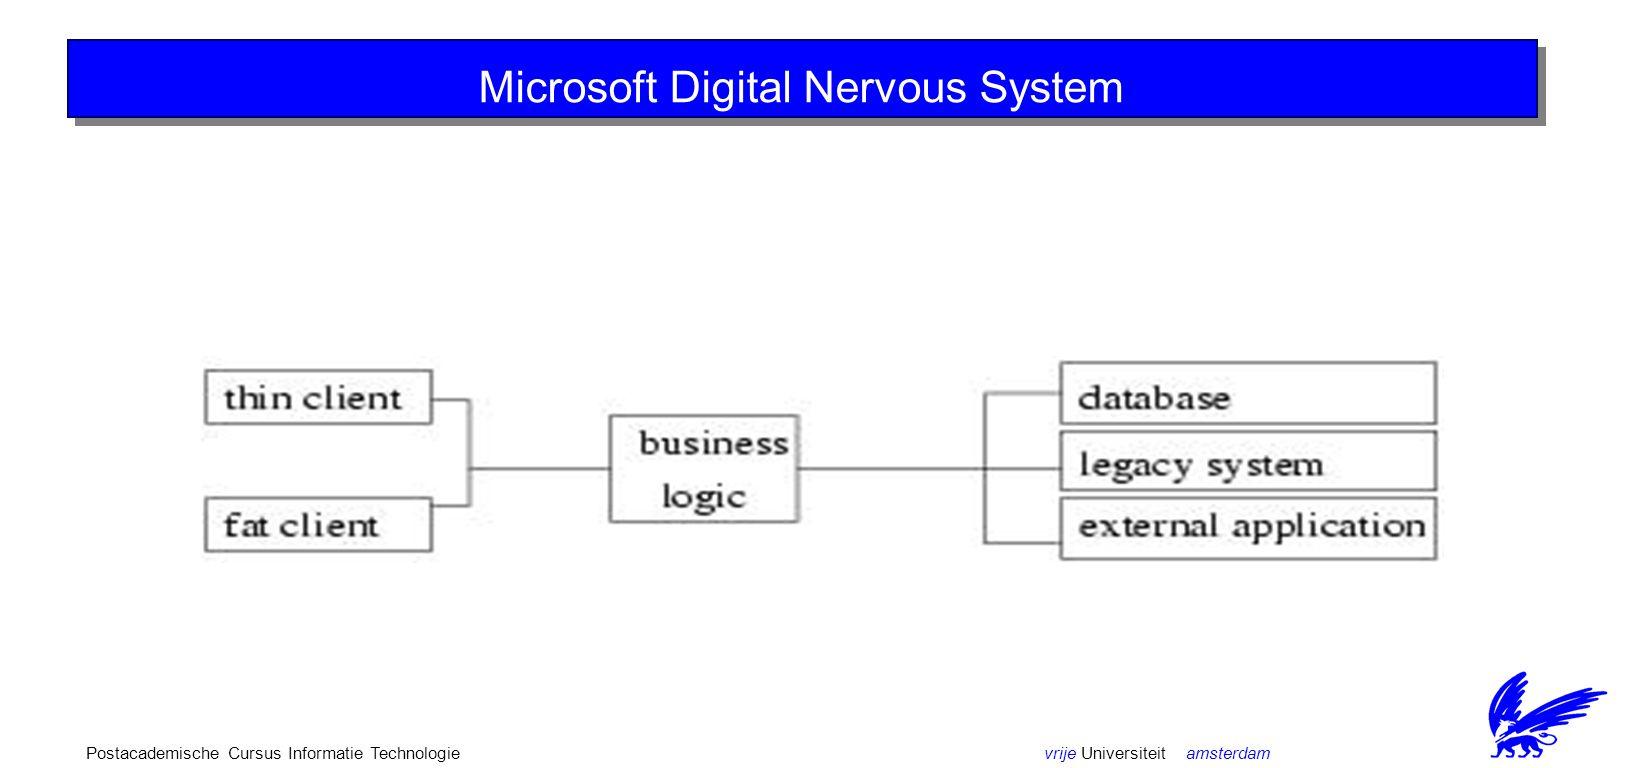 vrije Universiteit amsterdamPostacademische Cursus Informatie Technologie Microsoft Digital Nervous System